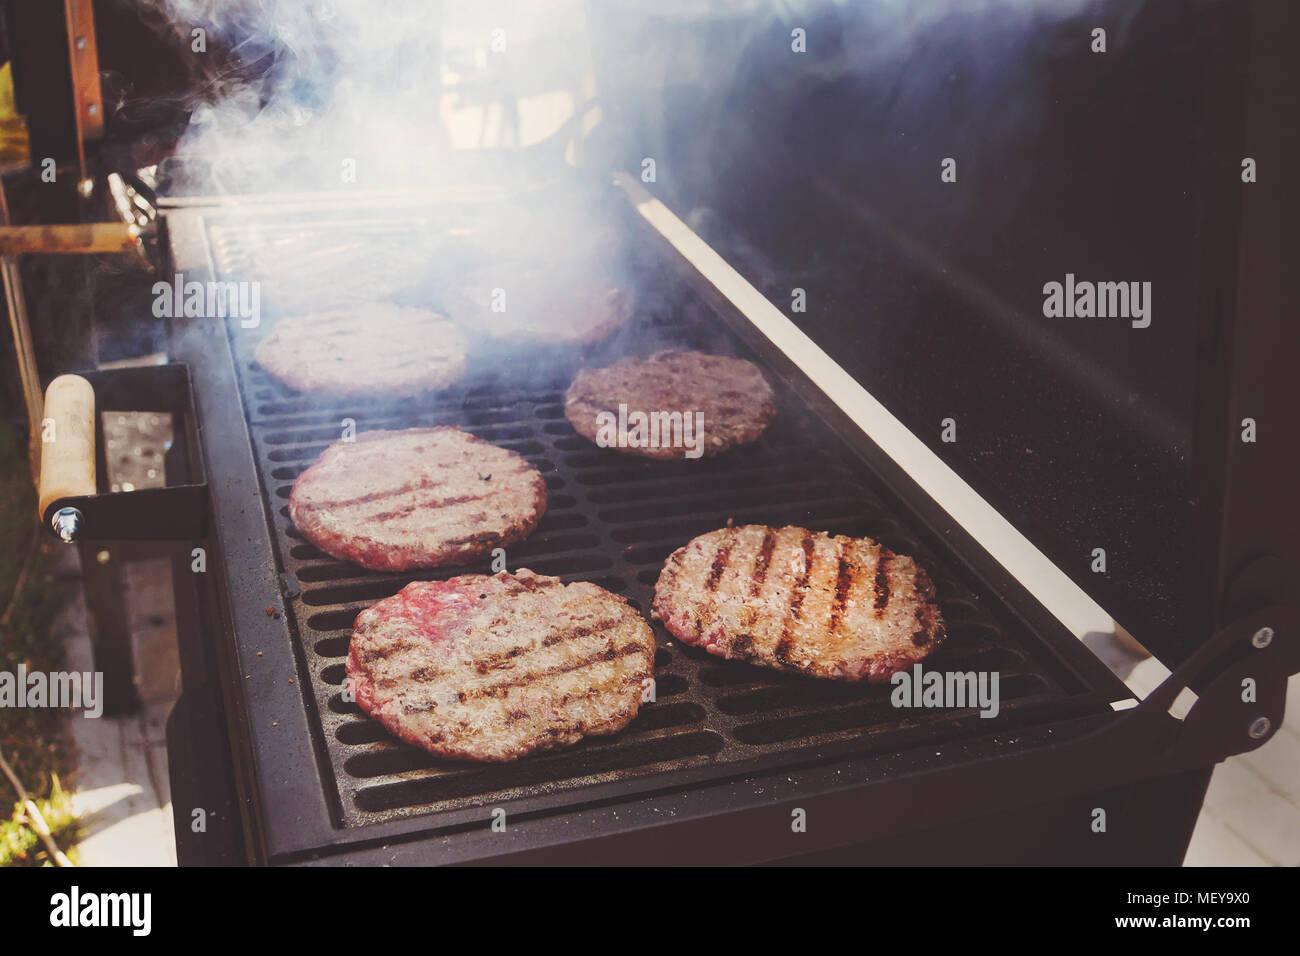 Grill Lines Stockfotos & Grill Lines Bilder - Alamy